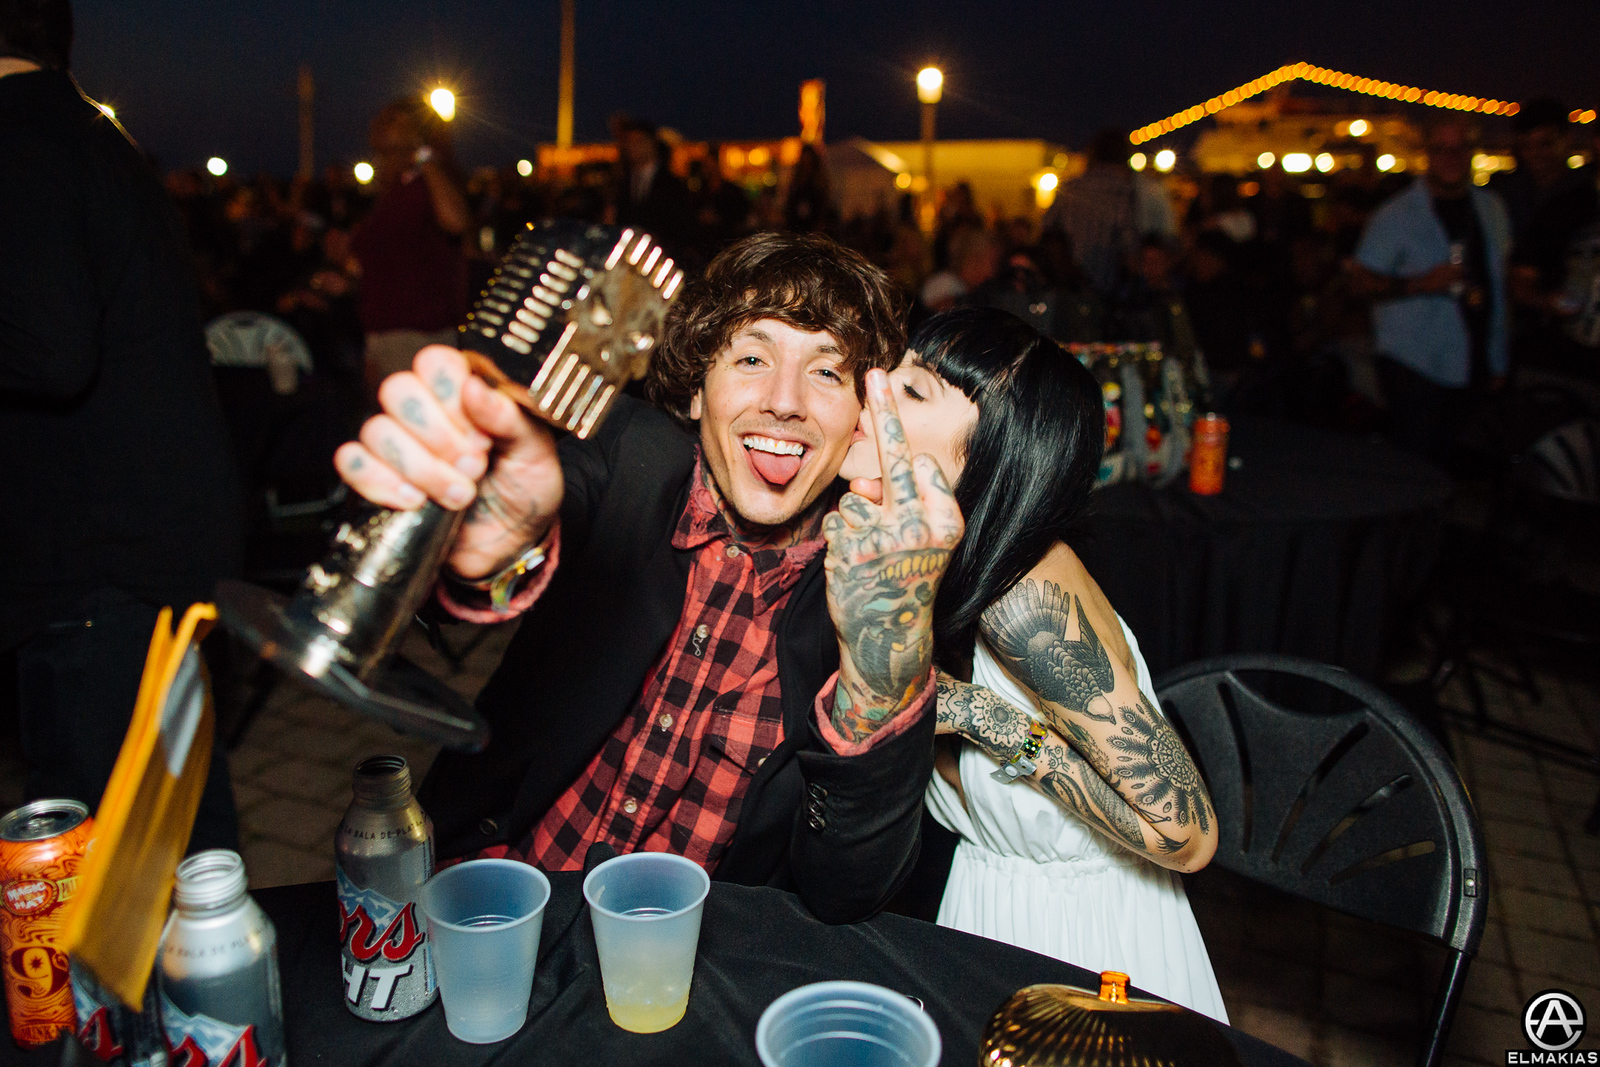 Oli and Hannah celebrating